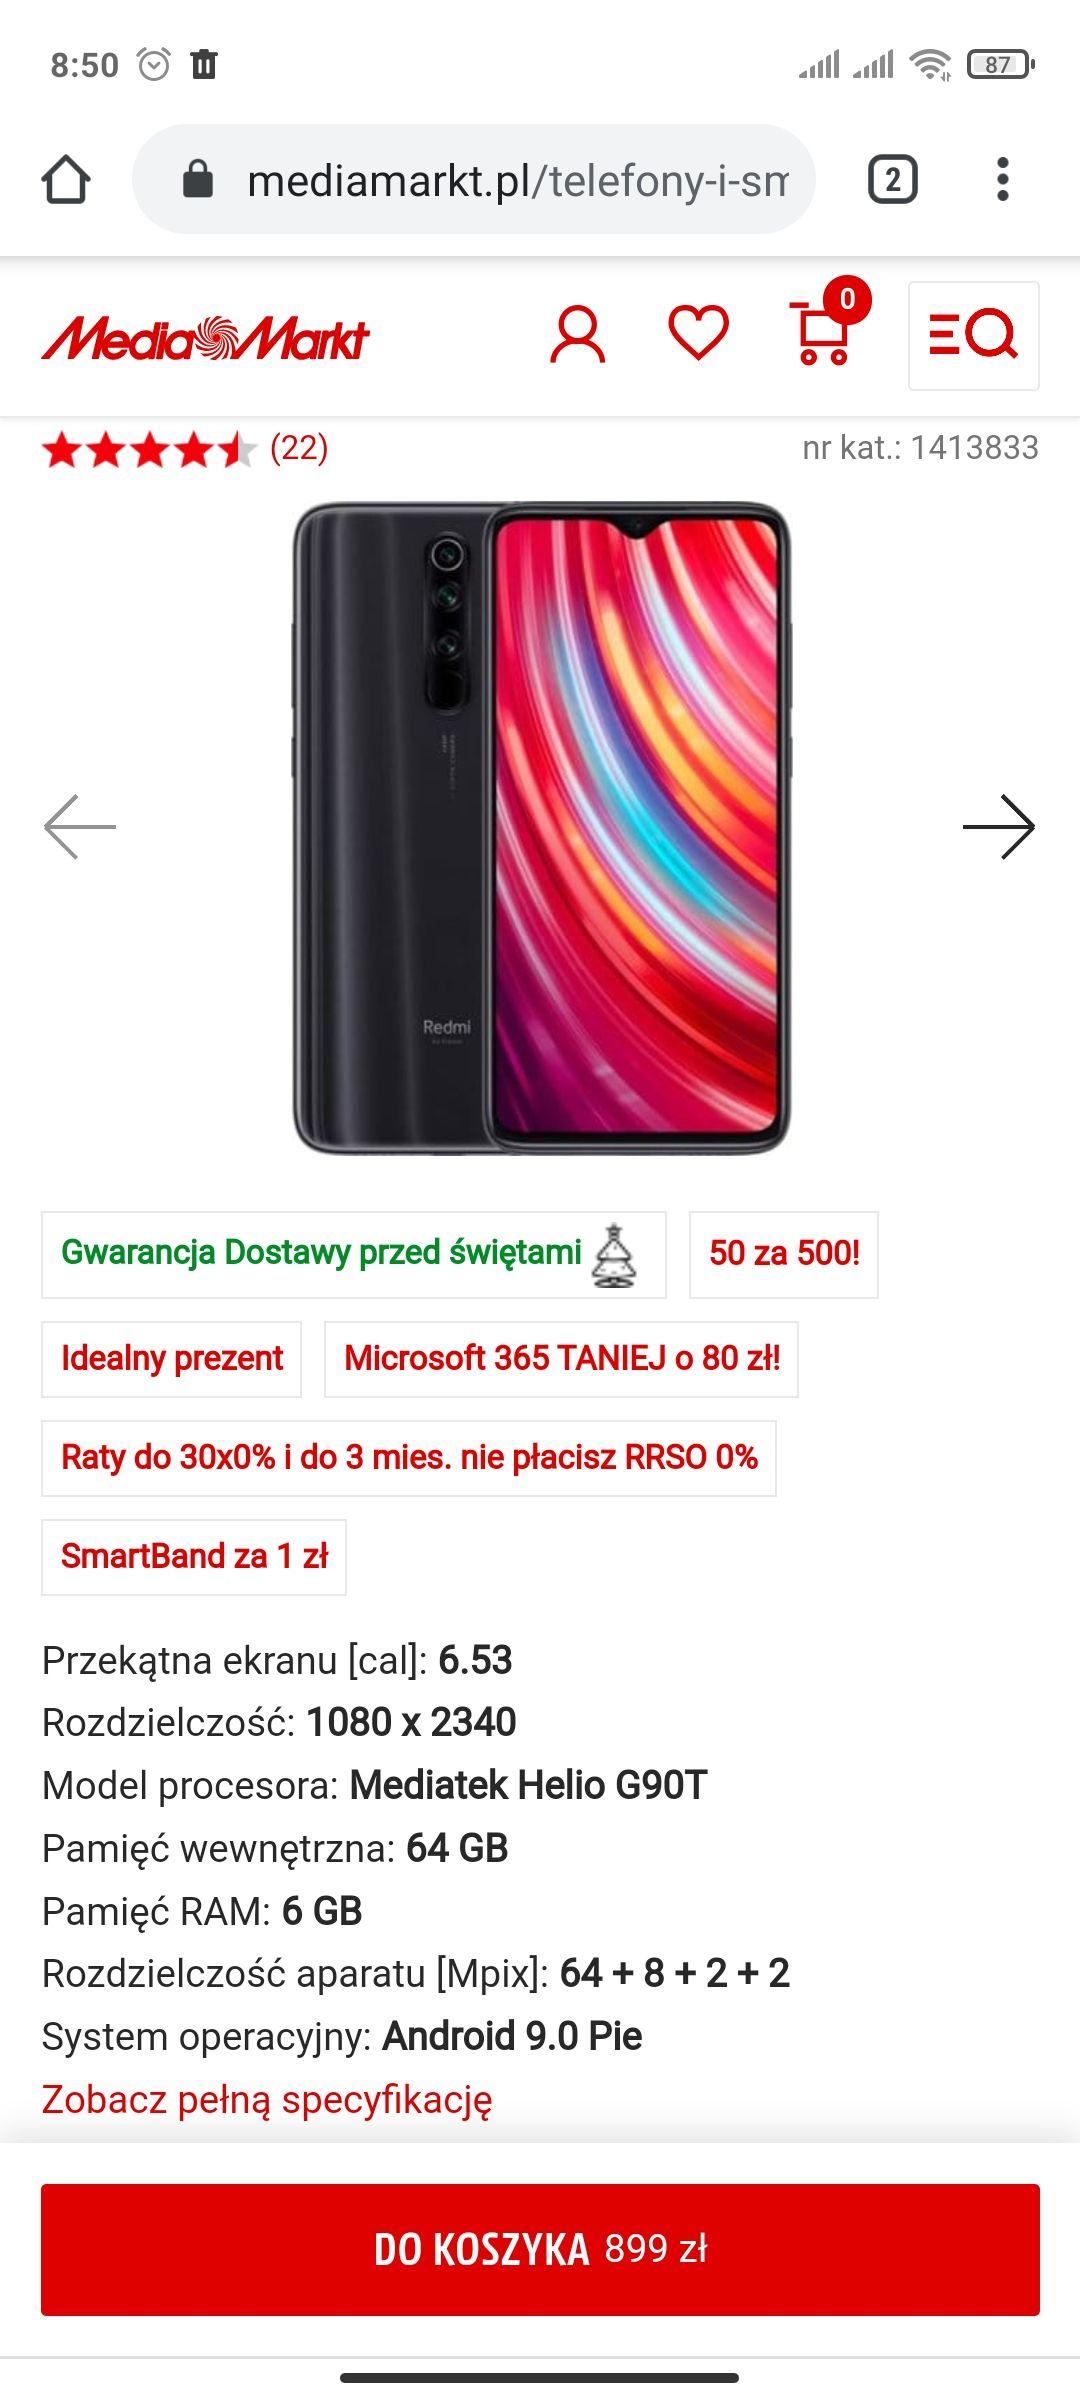 Xiaomi Redmi Note 8 PRO + mi band 4 + karta podarunkowa MediaMarkt 50 zł